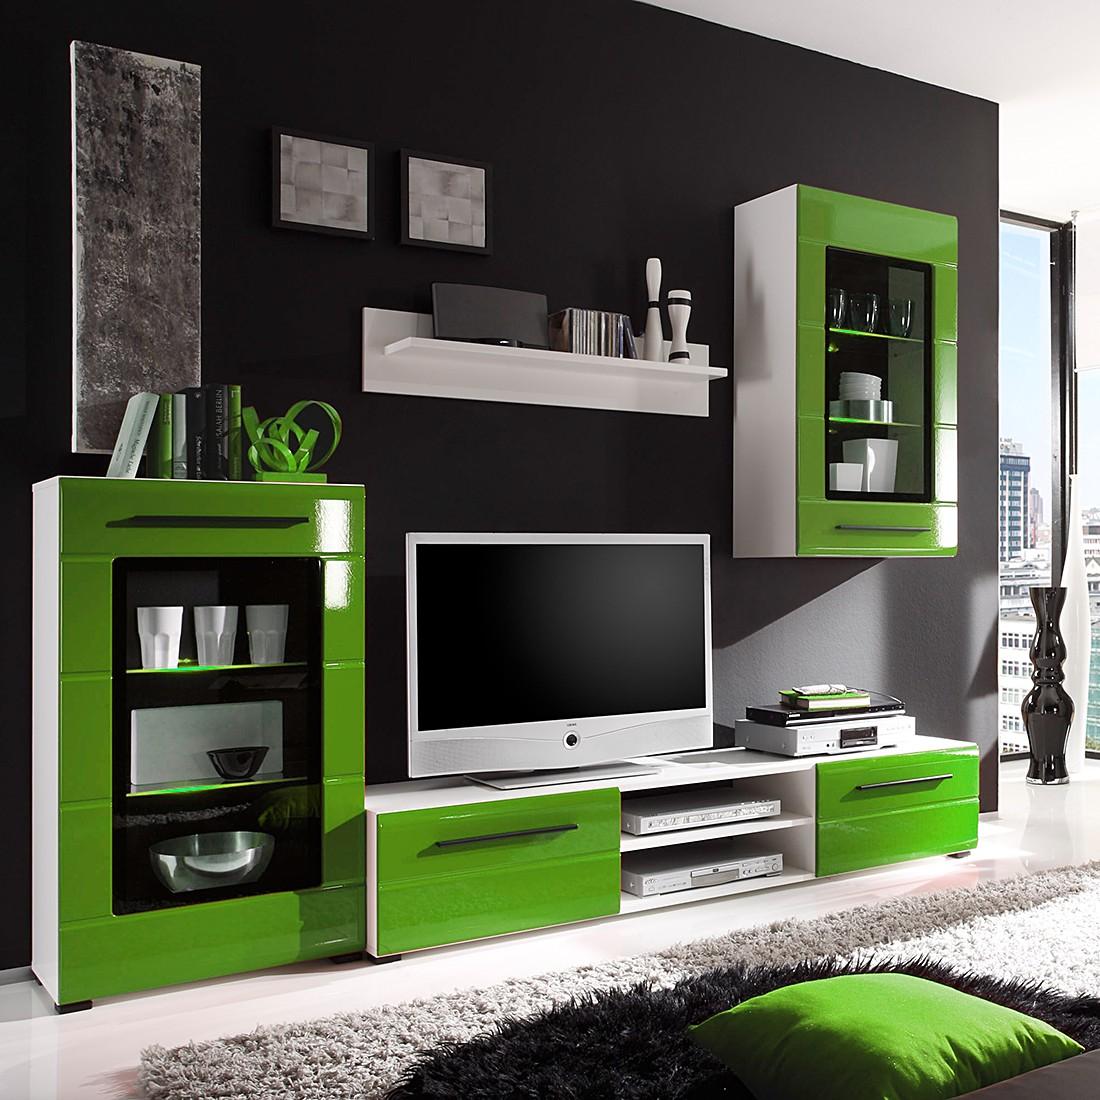 eek a wohnwand motley 4 teilig inklusive beleuchtung hochglanz gr n roomscape g nstig. Black Bedroom Furniture Sets. Home Design Ideas